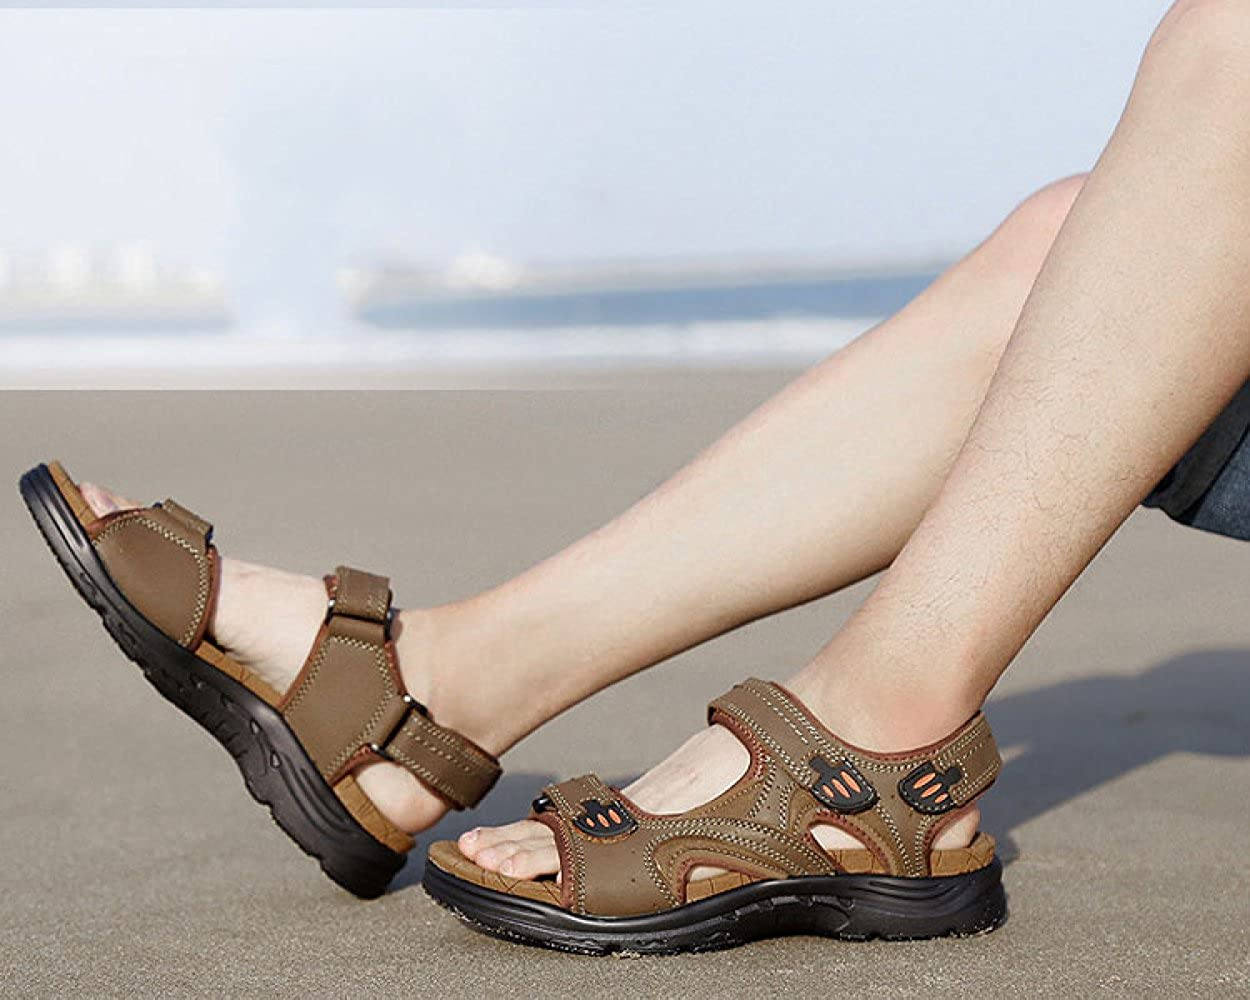 Herren Mode Sandalen Strandschuhe Outdoor Casual Mode Herren Klettverschluss Rutschfest Khaki 91c060